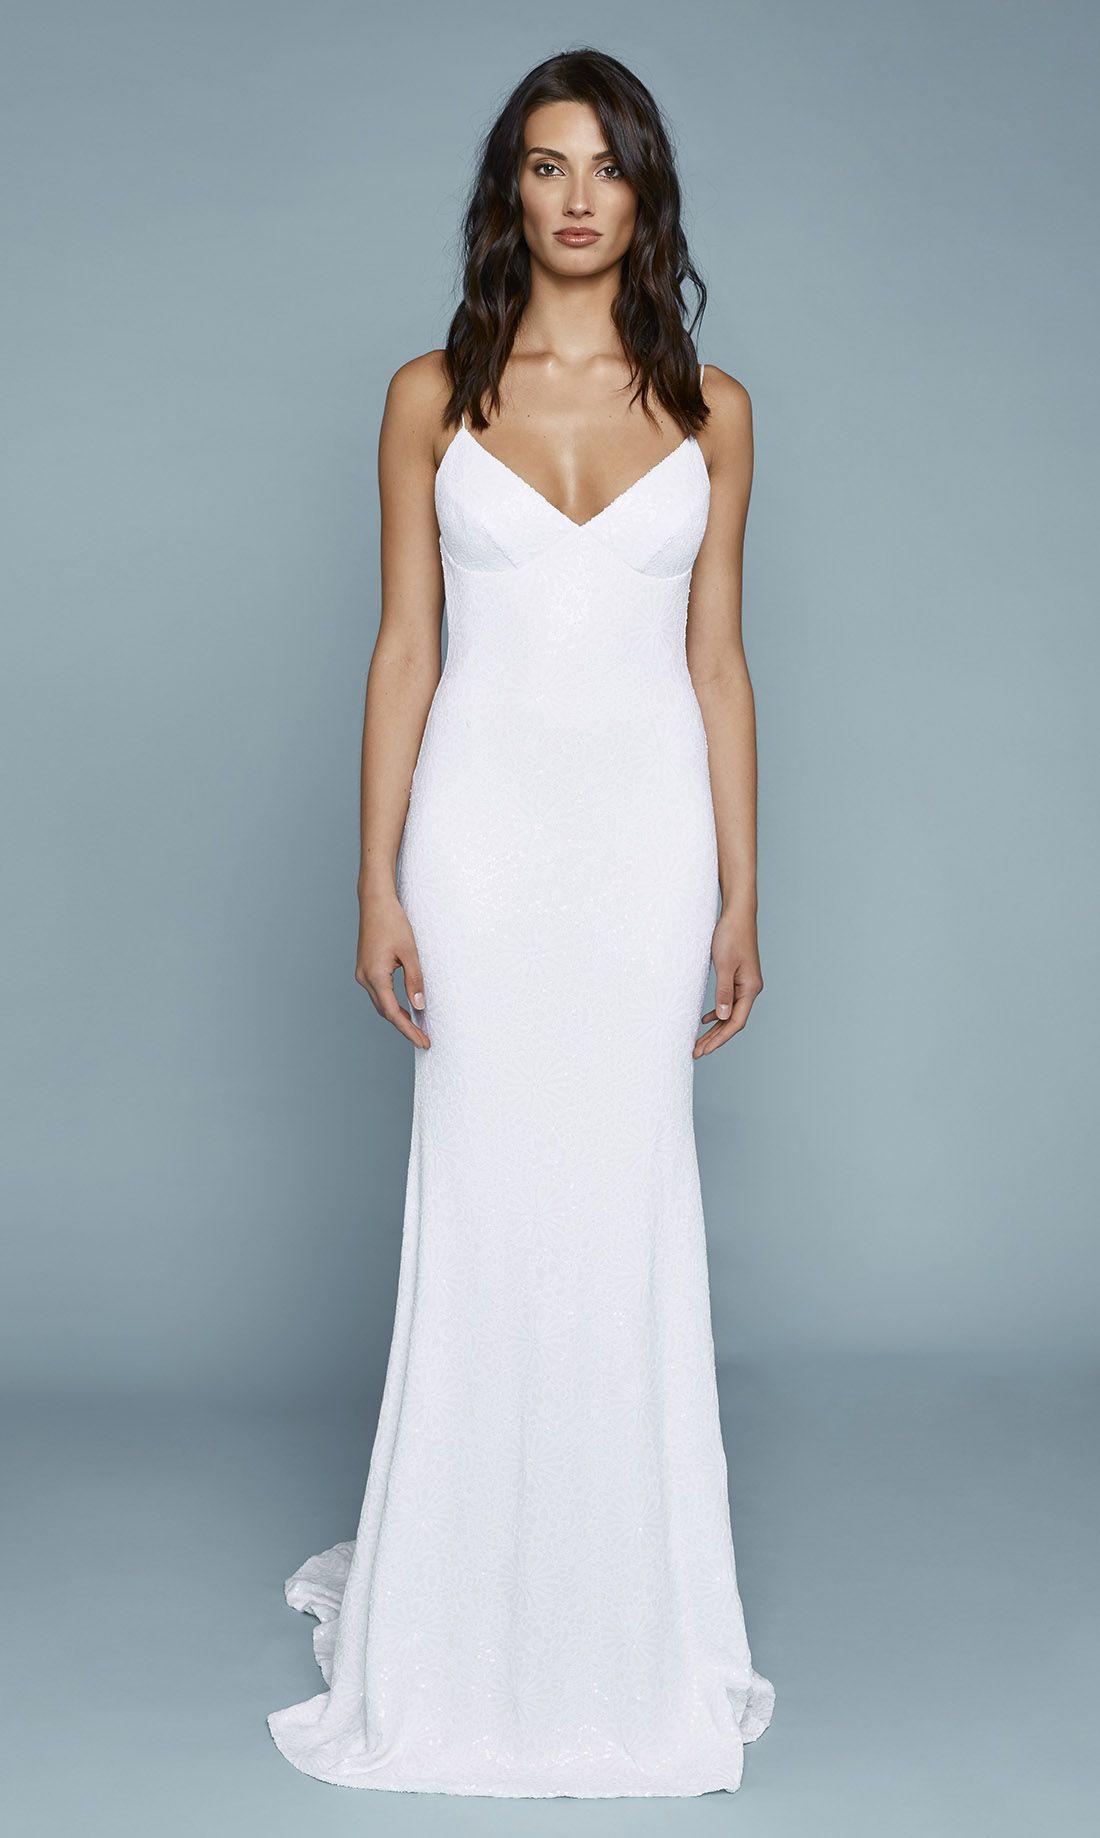 Sequin Lanai Gown | Wedding, Weddings and Wedding dress